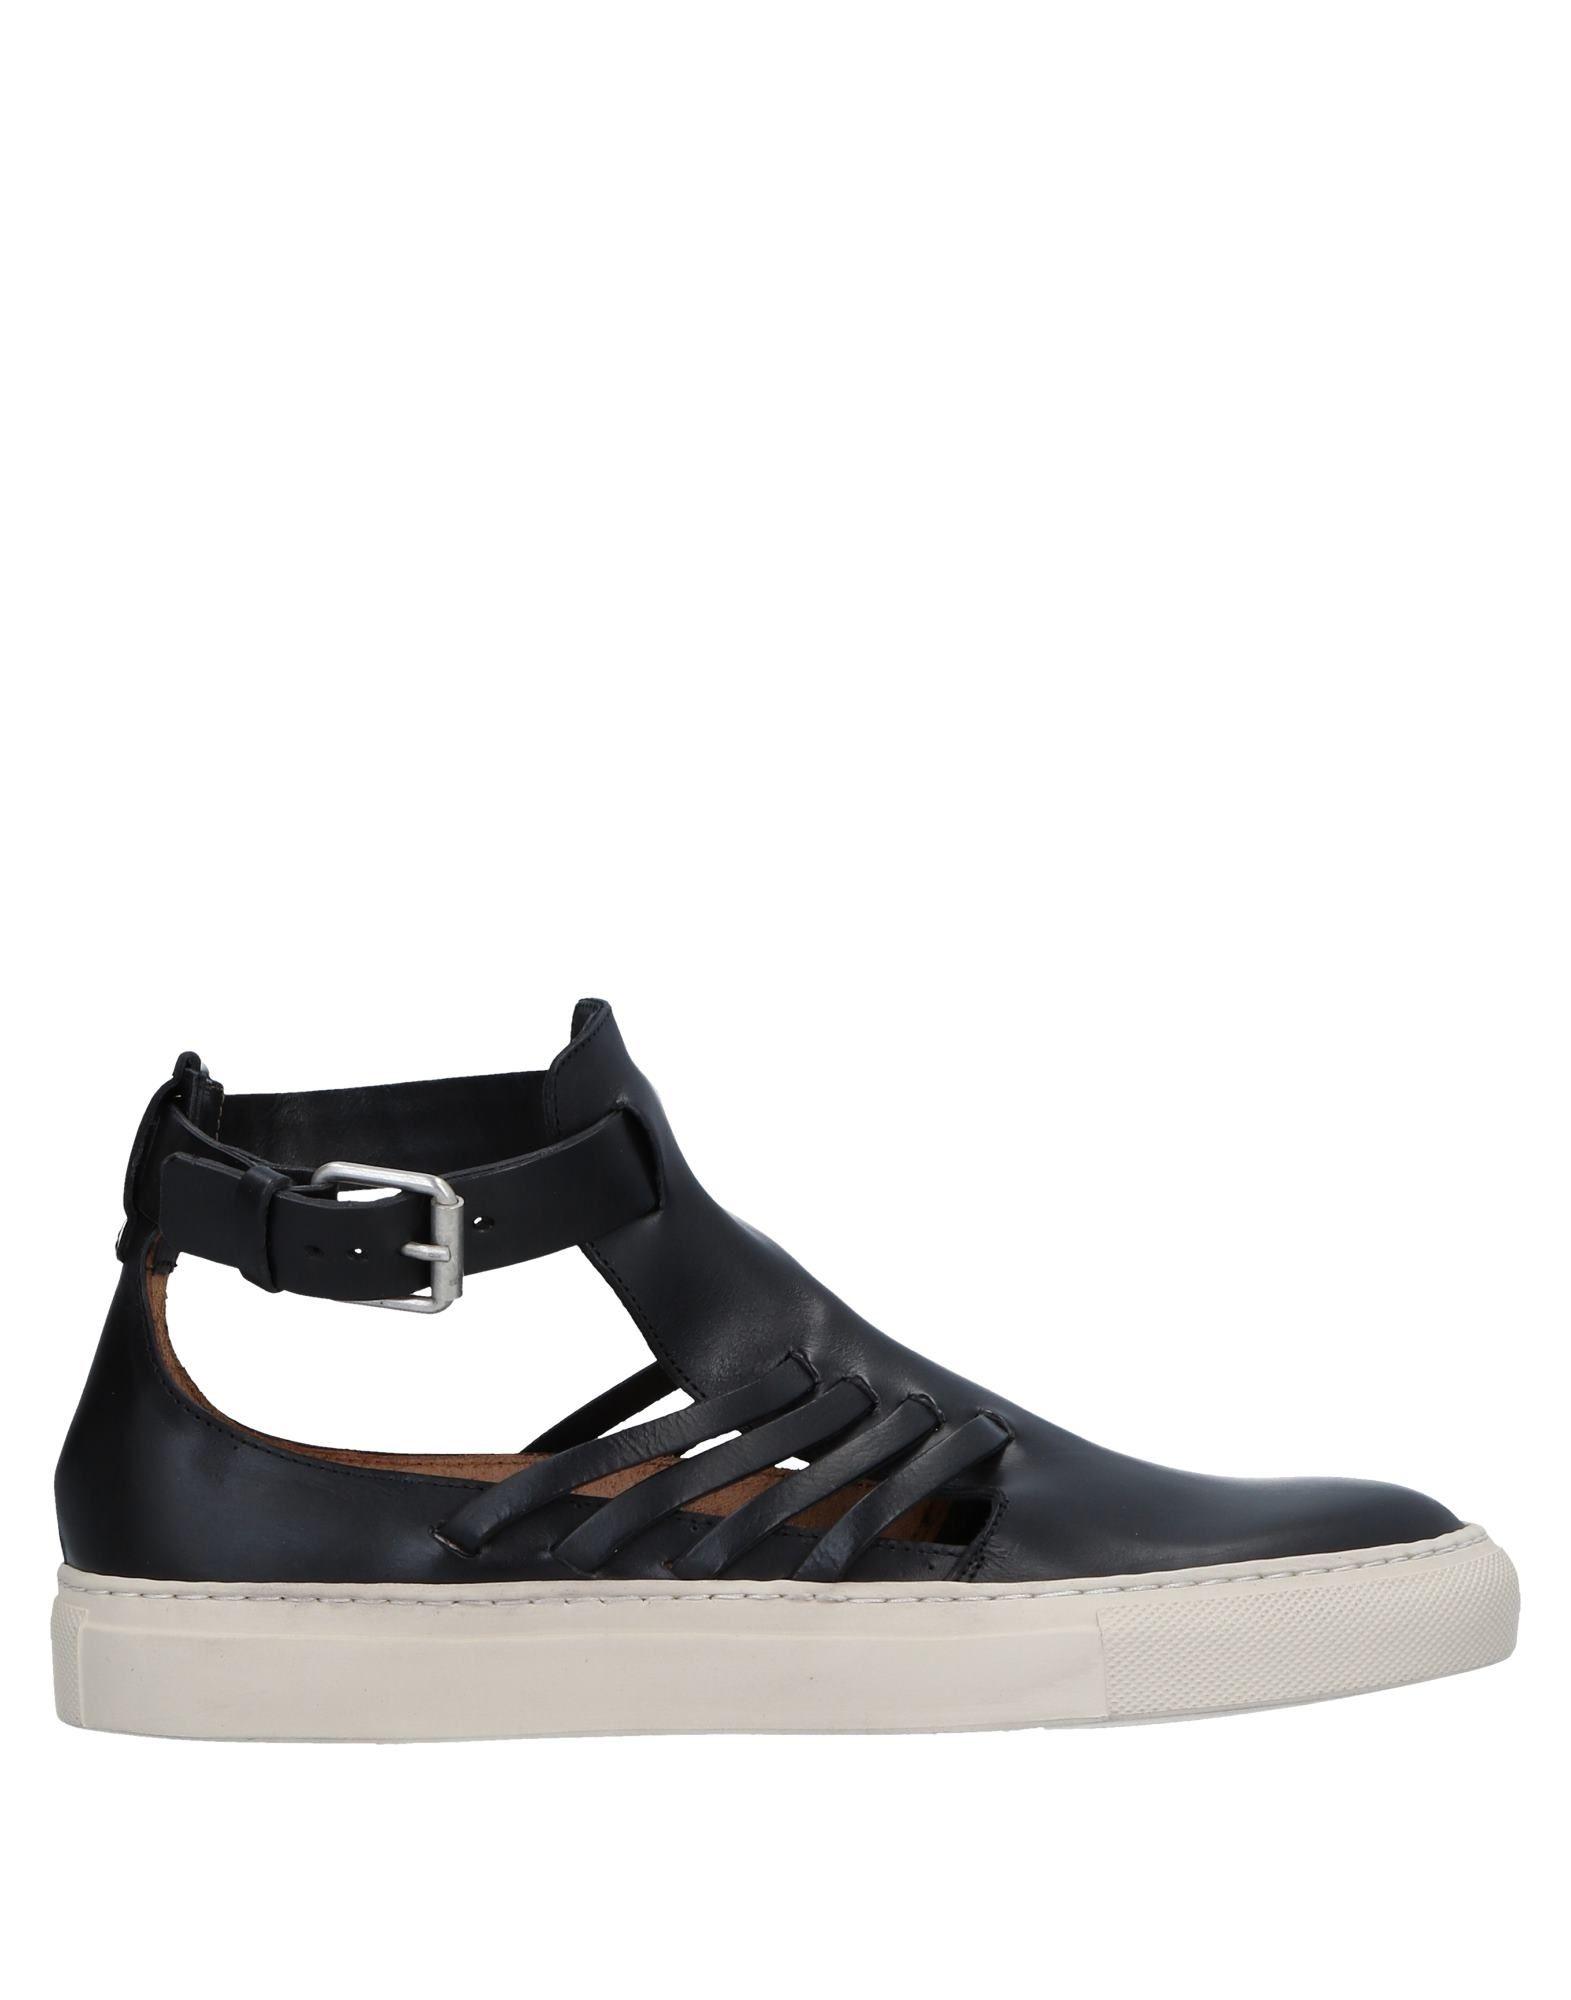 Buttero® Sandals - Women Buttero® Sandals online on 11544078GL  United Kingdom - 11544078GL on 142d0c